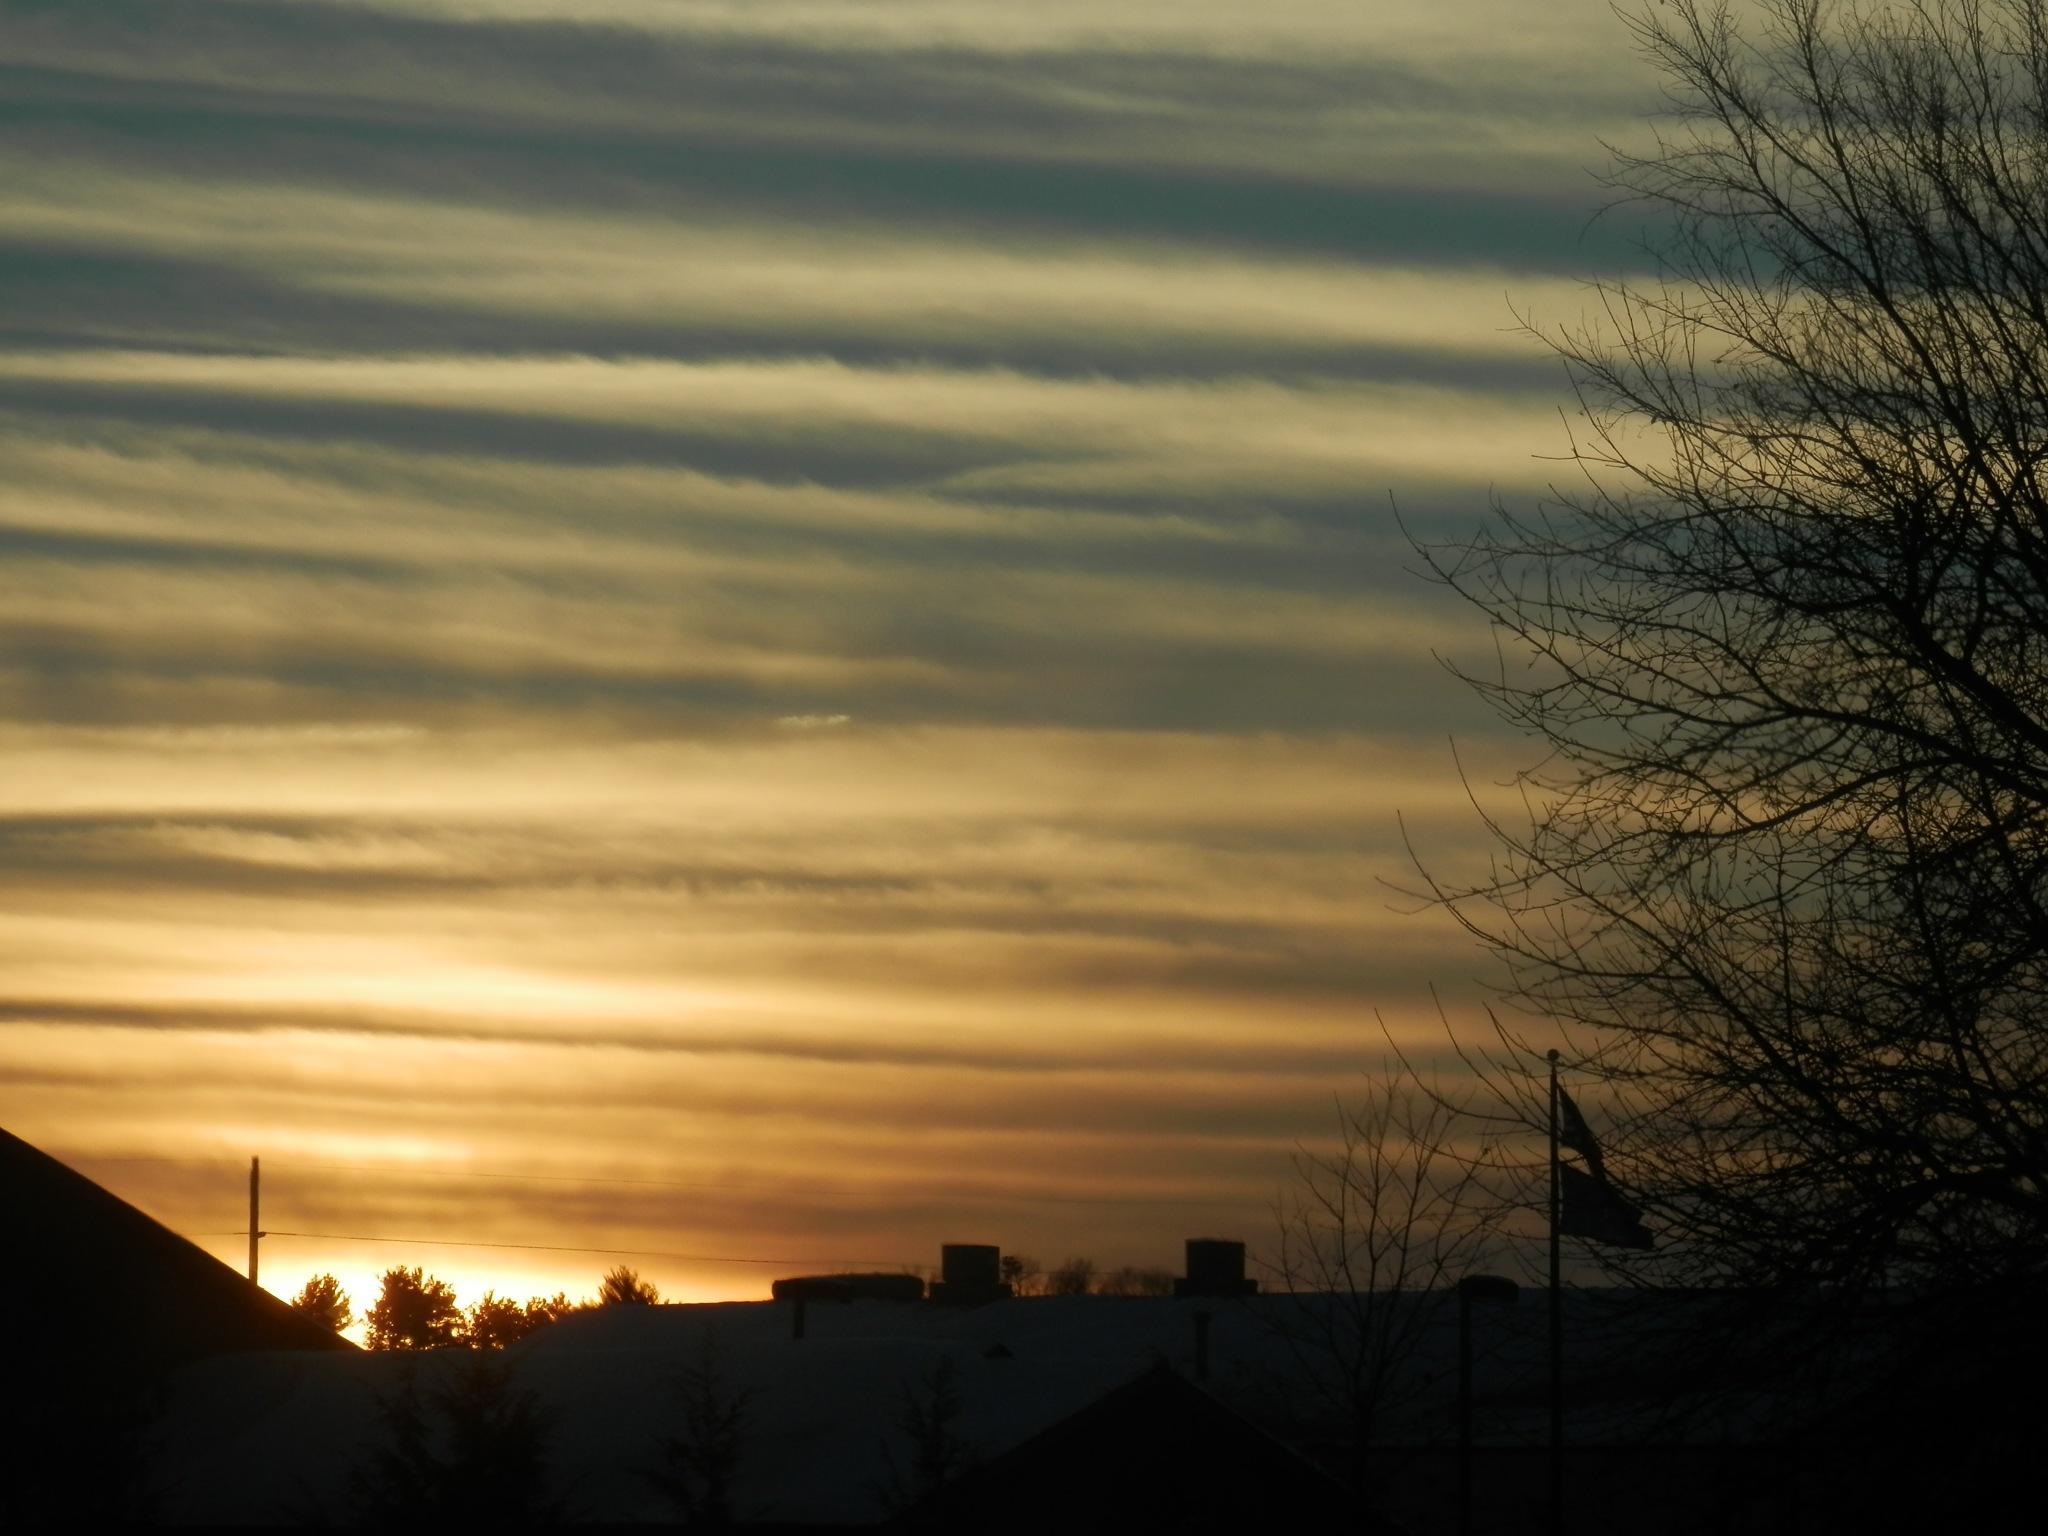 Sky Patterns by William Presley